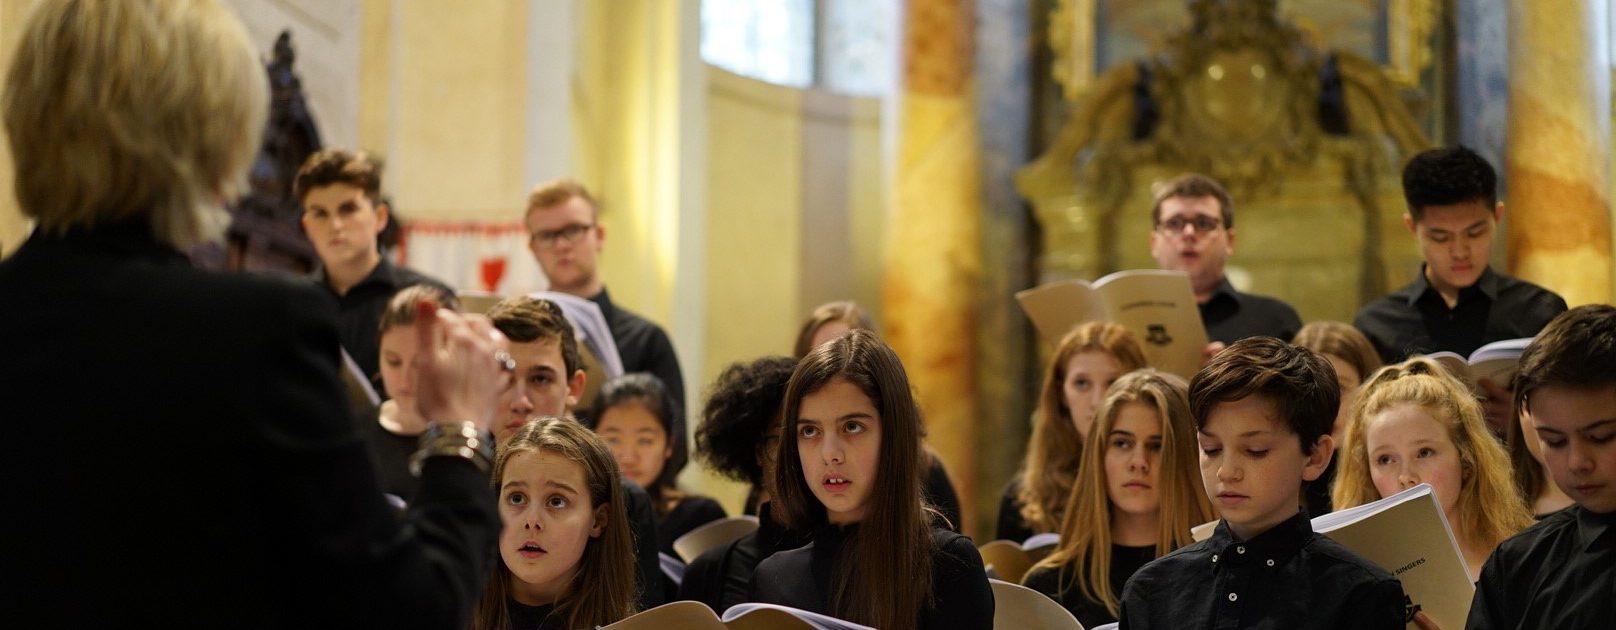 Caterham's Choirs Perform in Prague